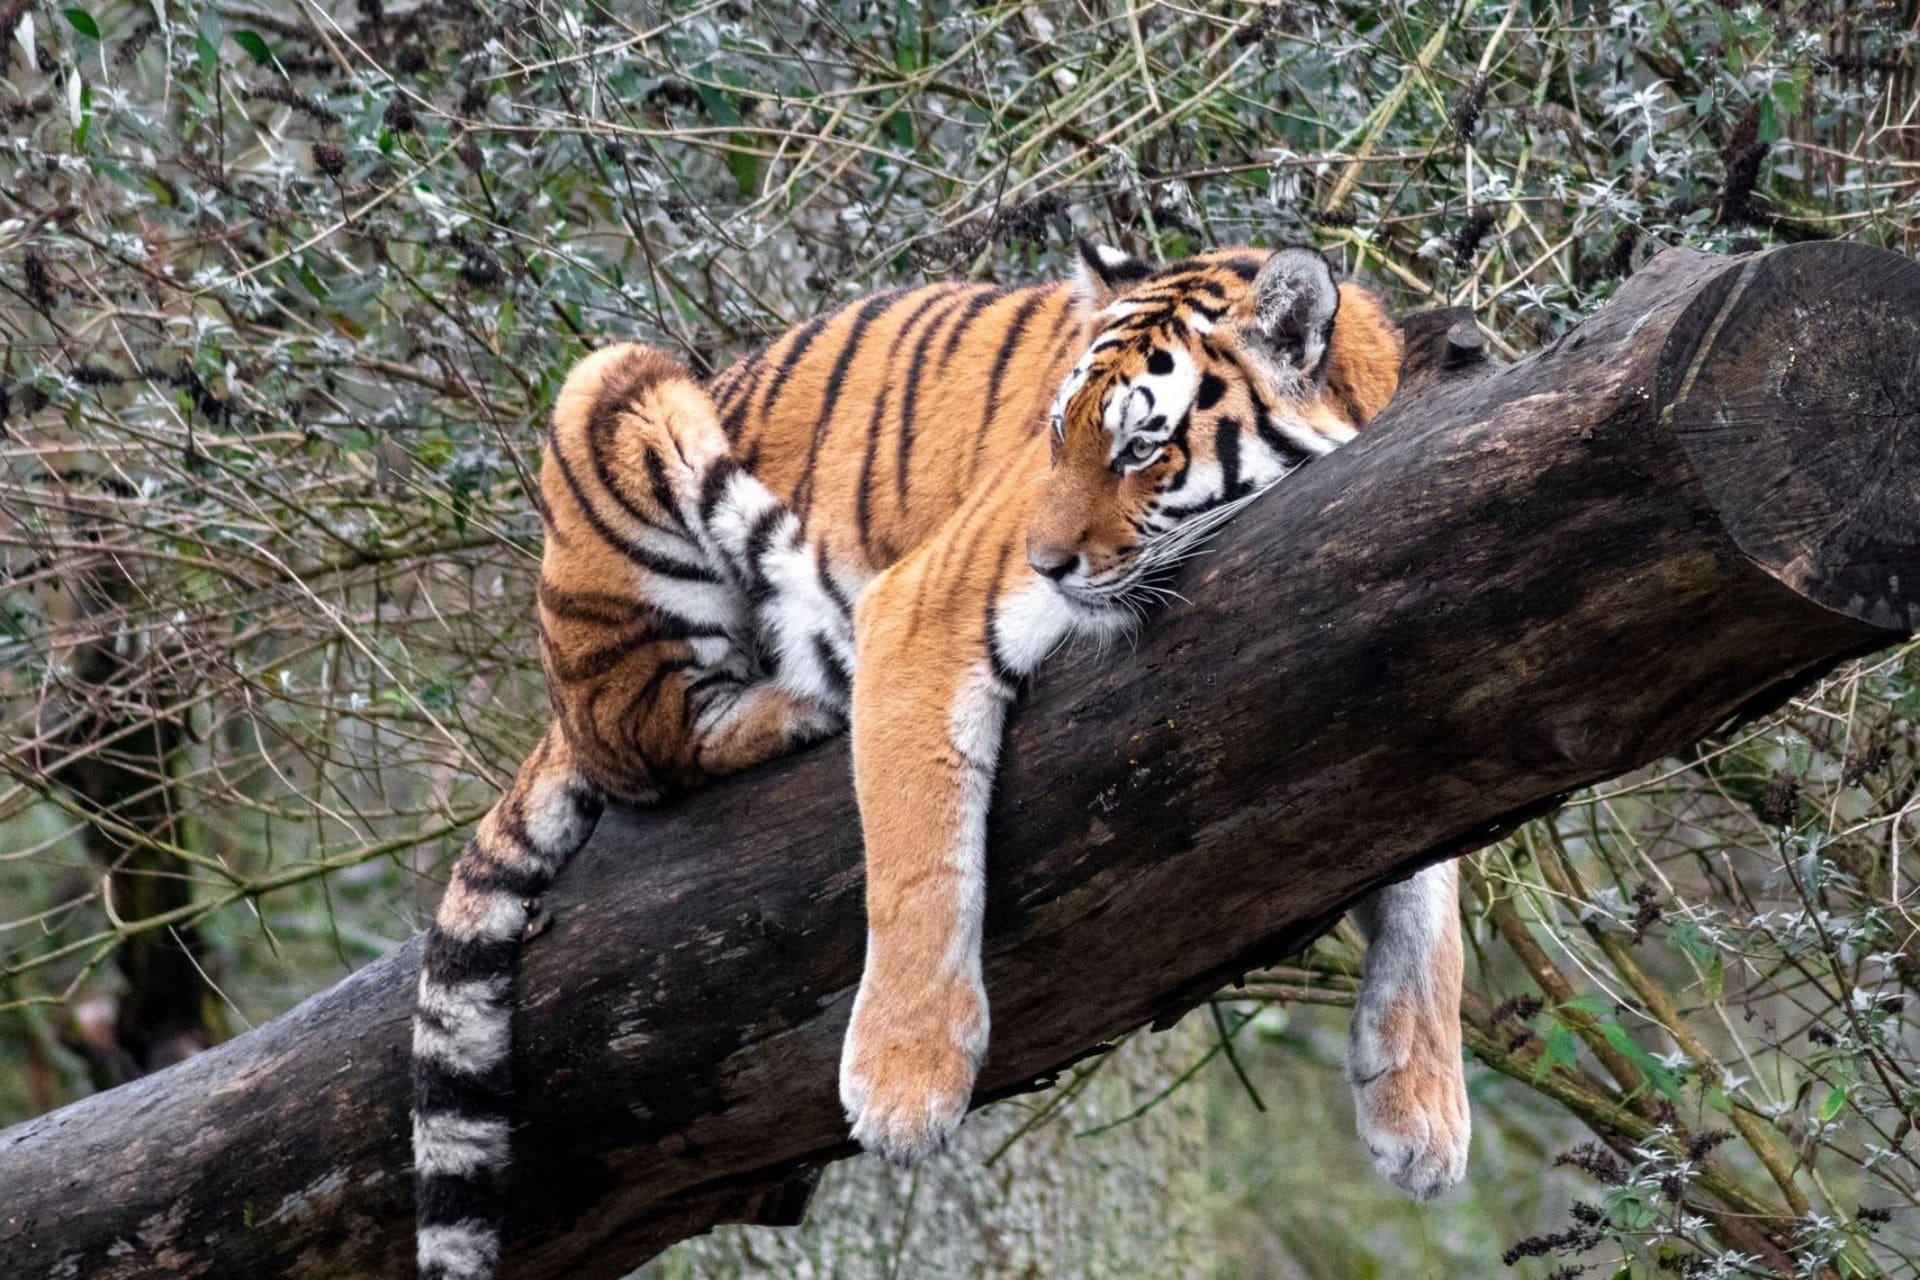 tiger-lying-down-on-tree-log-at-longleat-safari-park